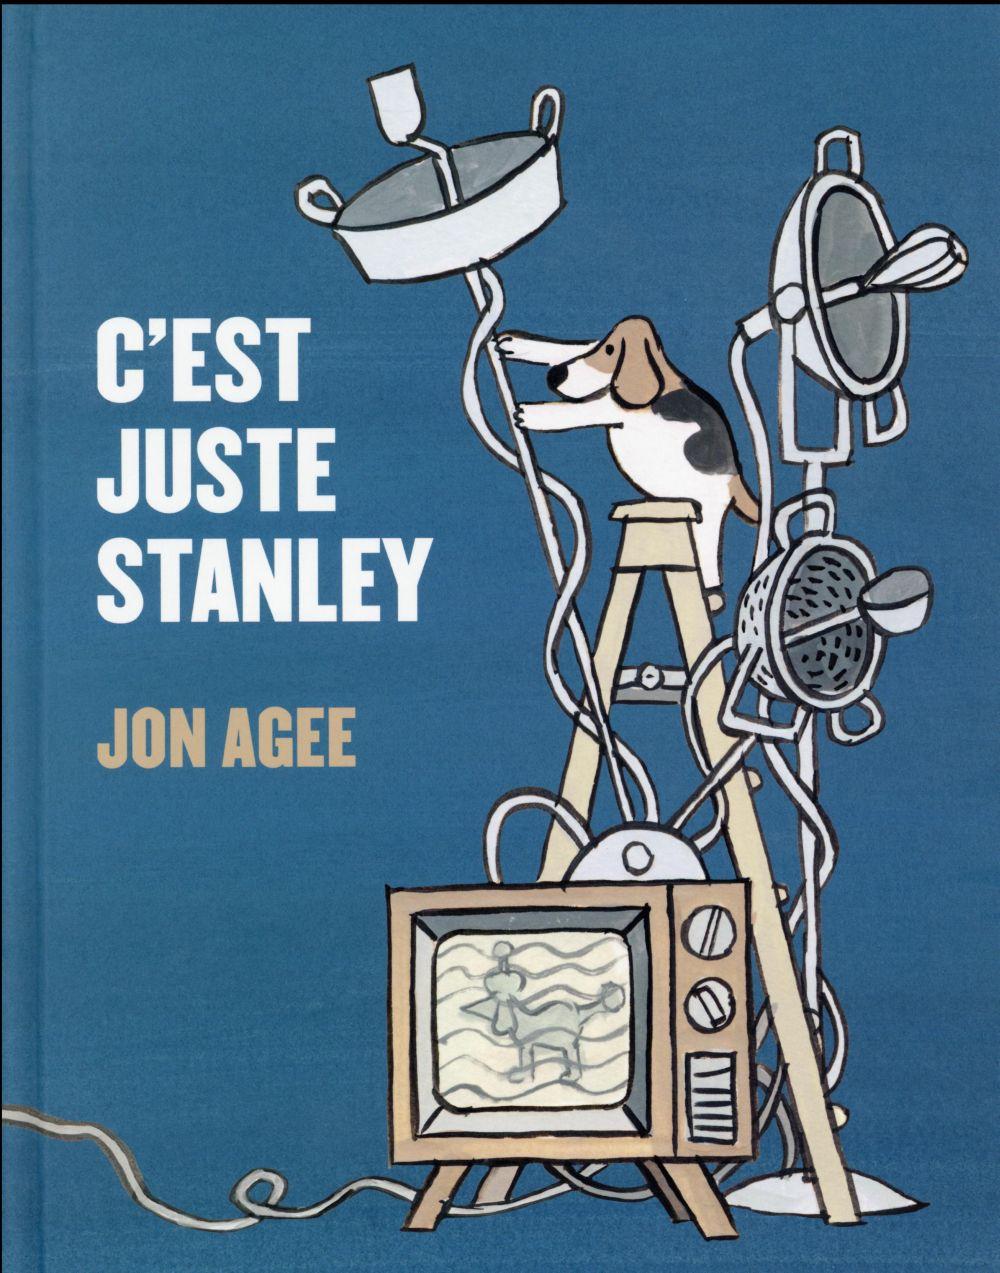 C EST JUSTE STANLEY